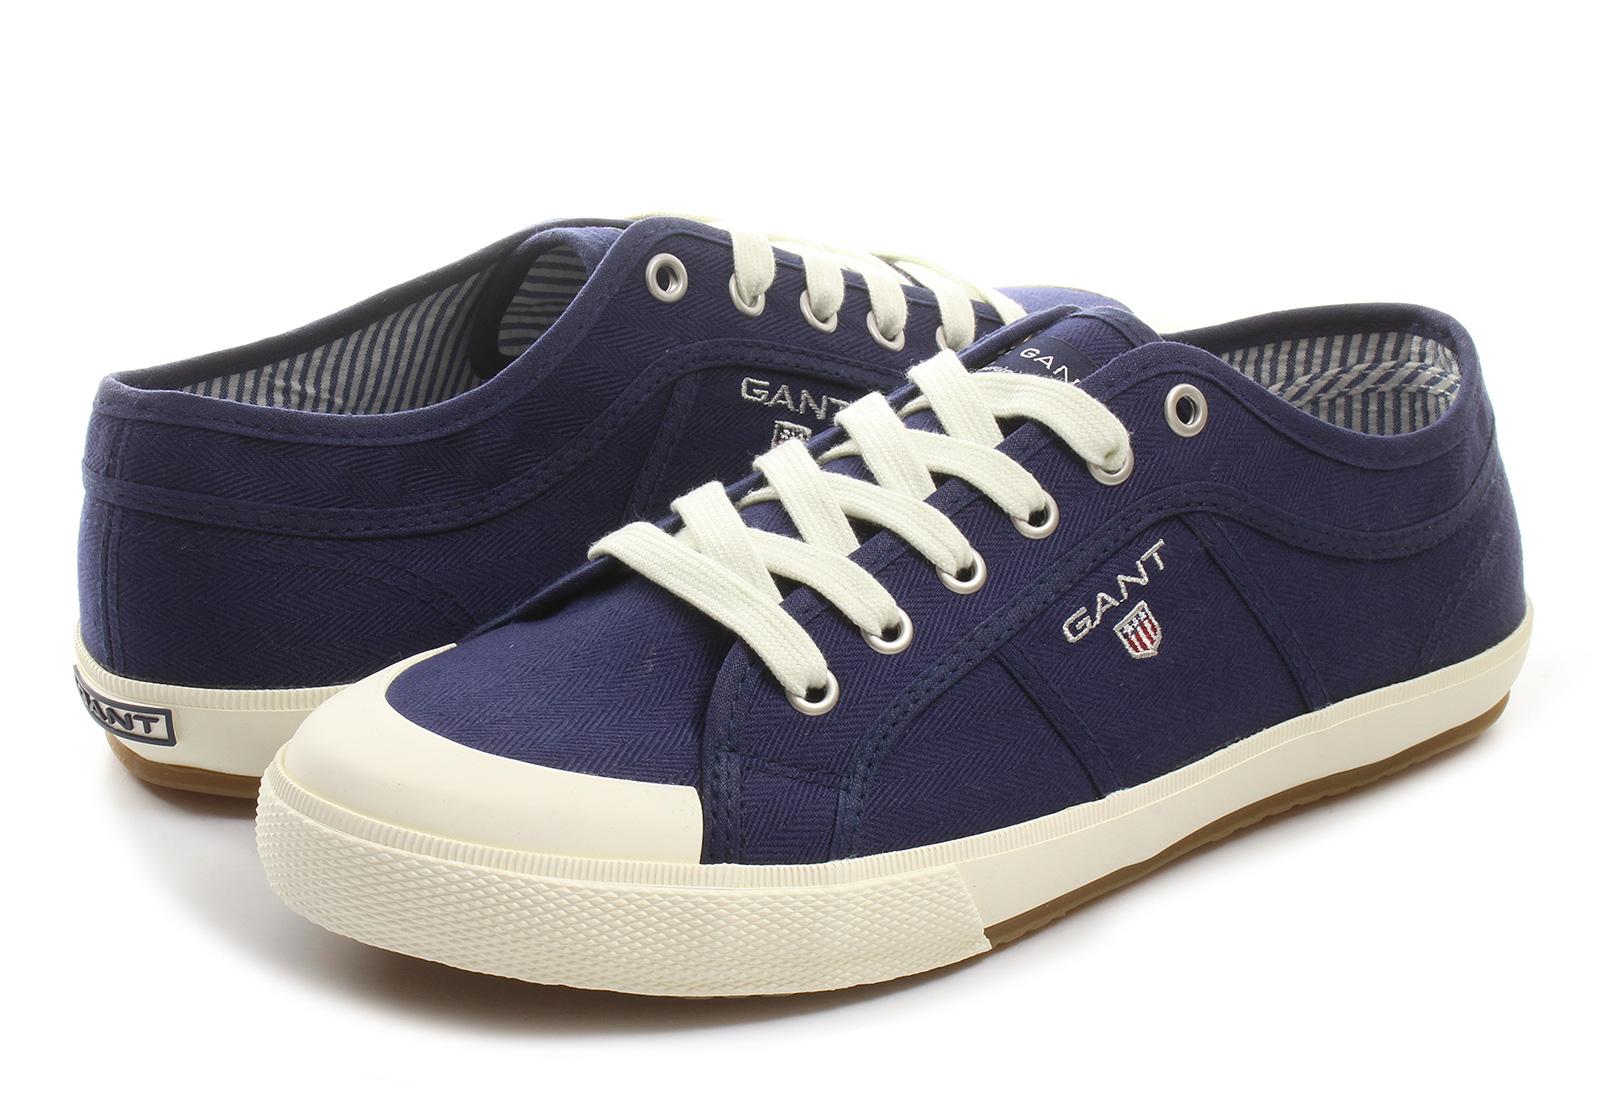 gant shoes samuel 10638590 g65 online shop for sneakers shoes and boots. Black Bedroom Furniture Sets. Home Design Ideas